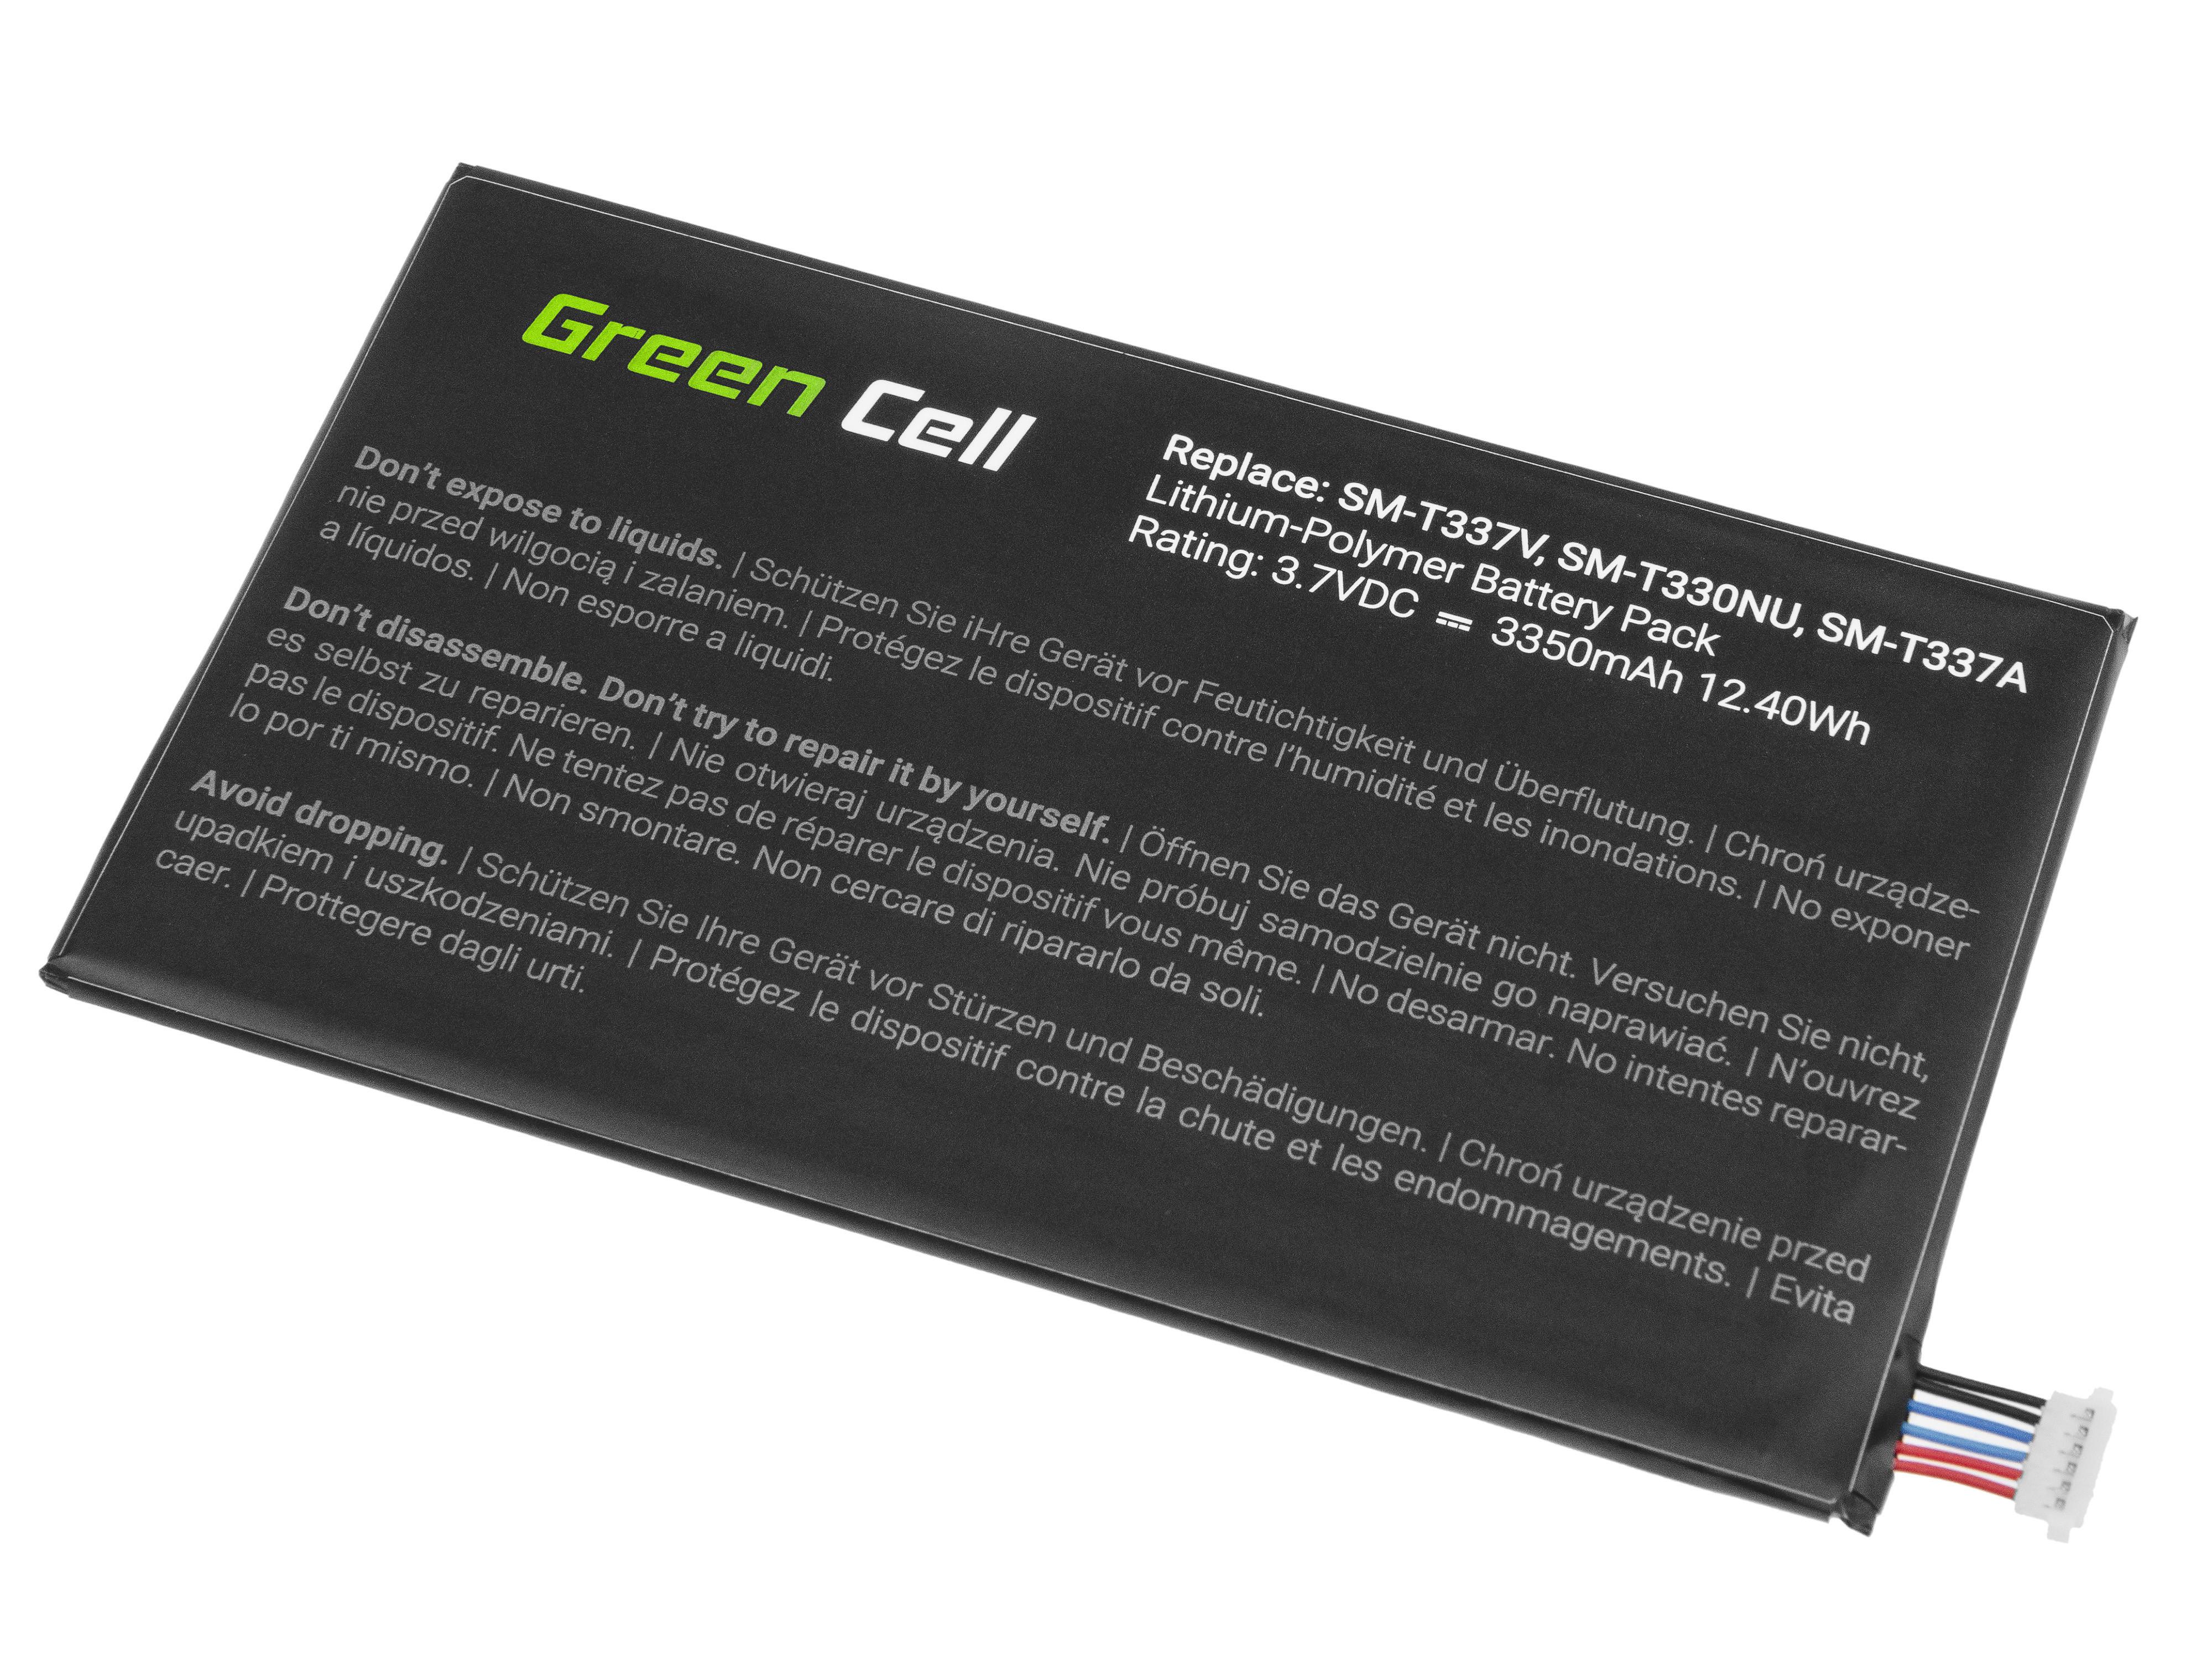 Green Cell TAB43 Baterie Samsung EB-BT330FBU pro Samsung Galaxy Tab 4 8.0 T330 T331 T337 3350mAh Li-Pol – neoriginální